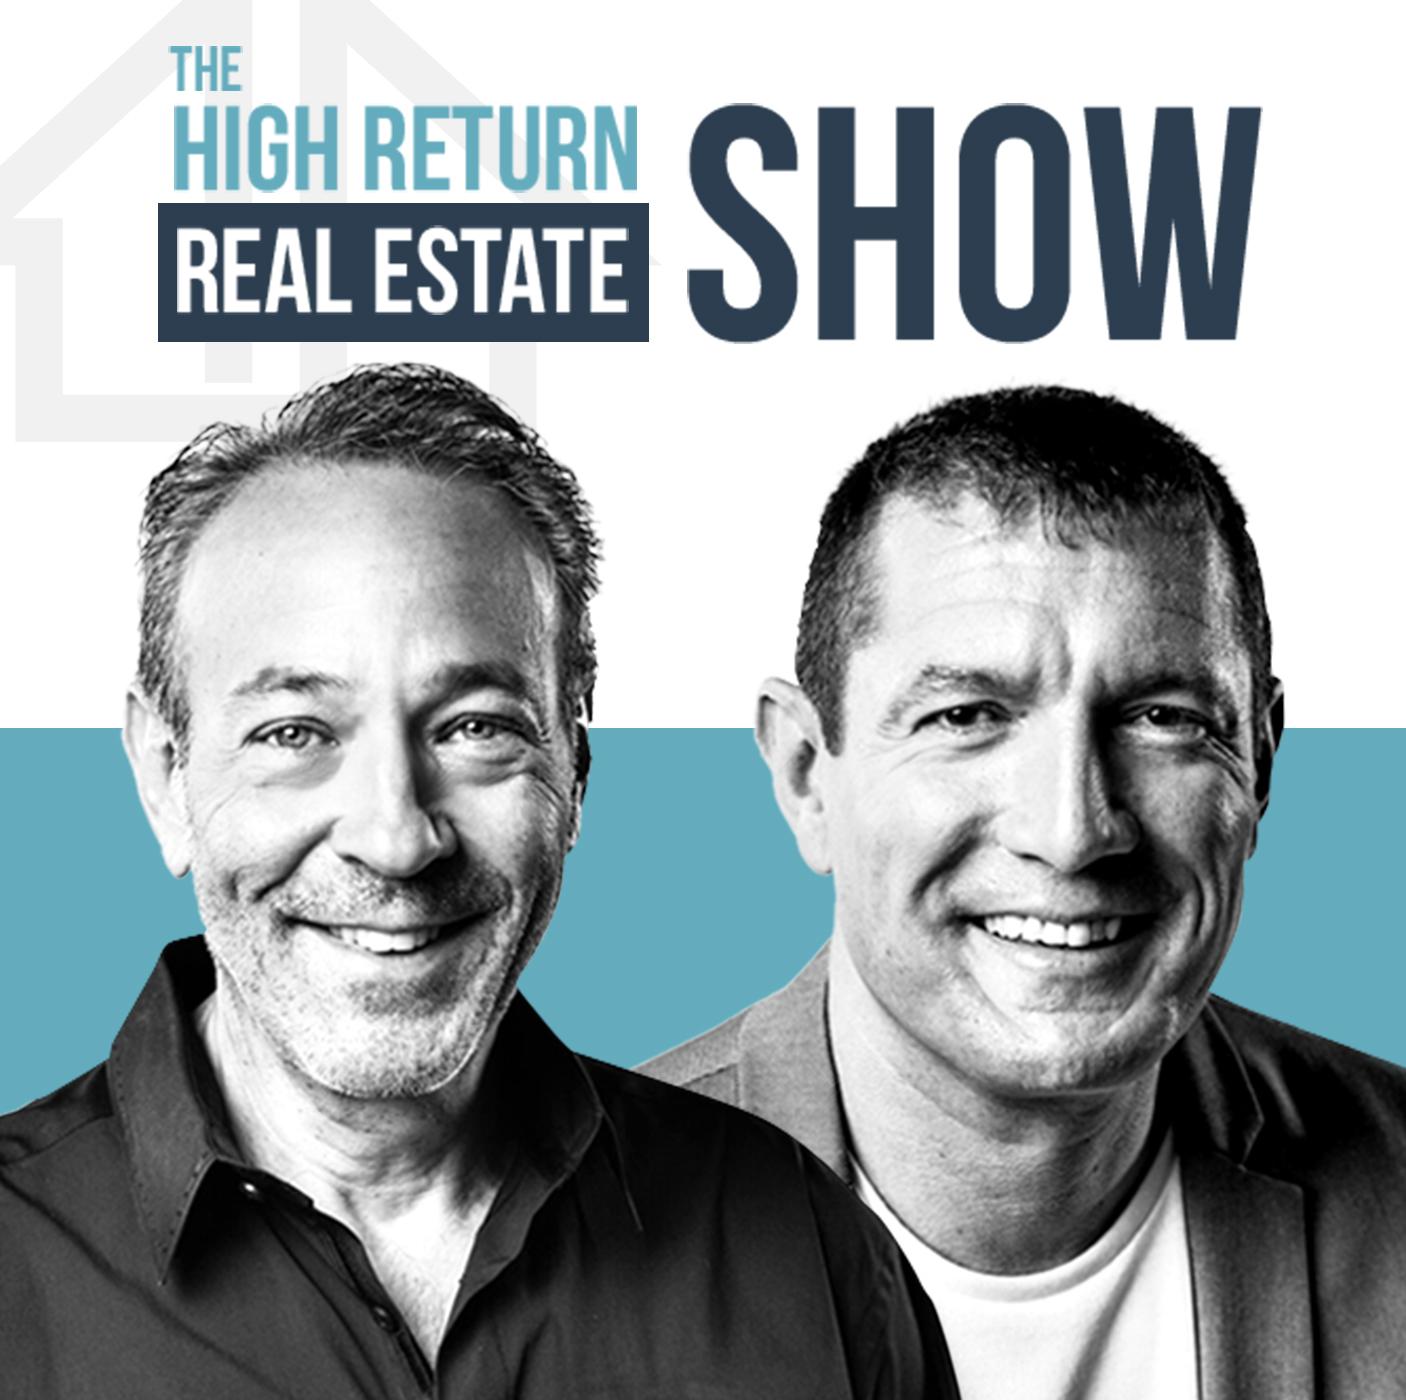 The High Return Real Estate Show  show art